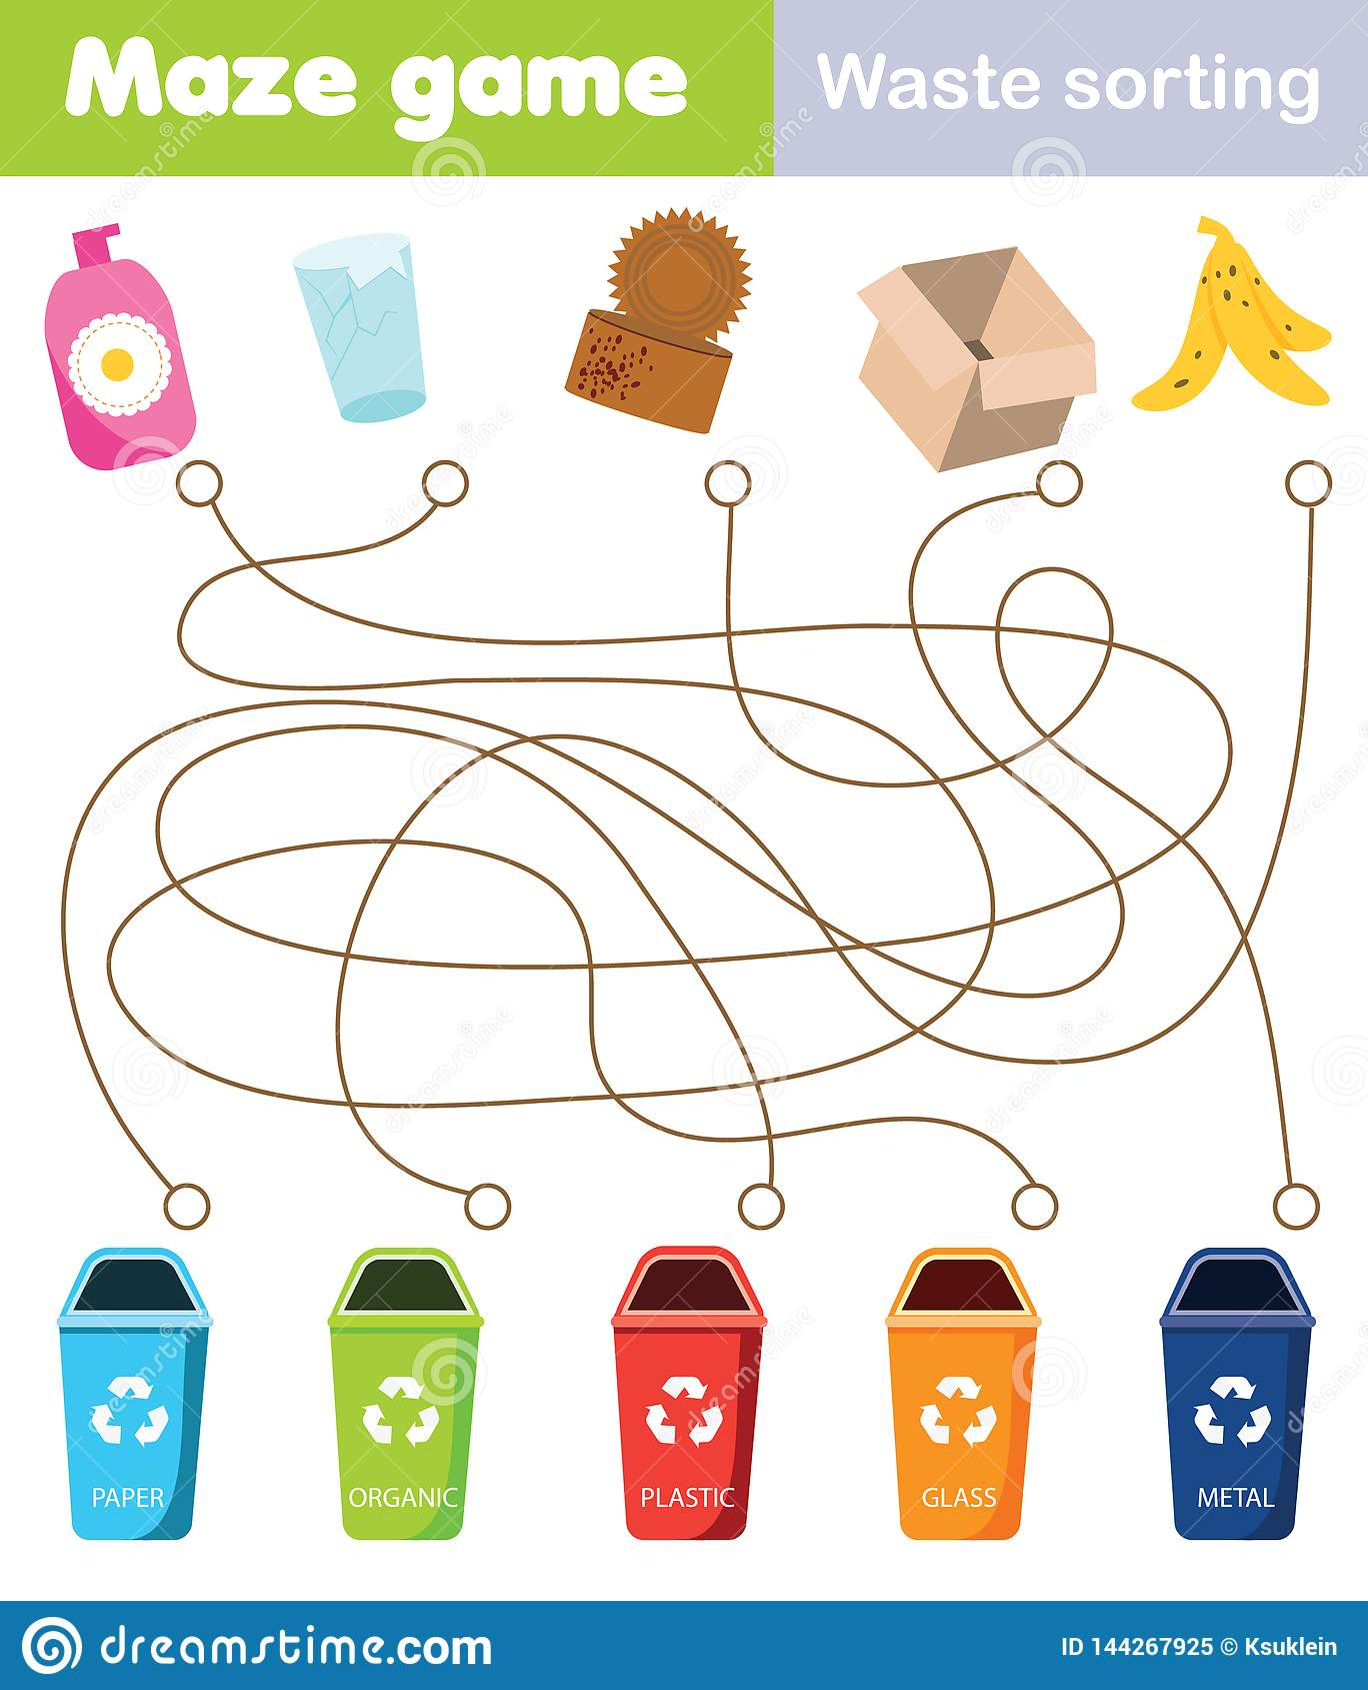 Maze Game For Children Connect Waste And Trash Bin Waste